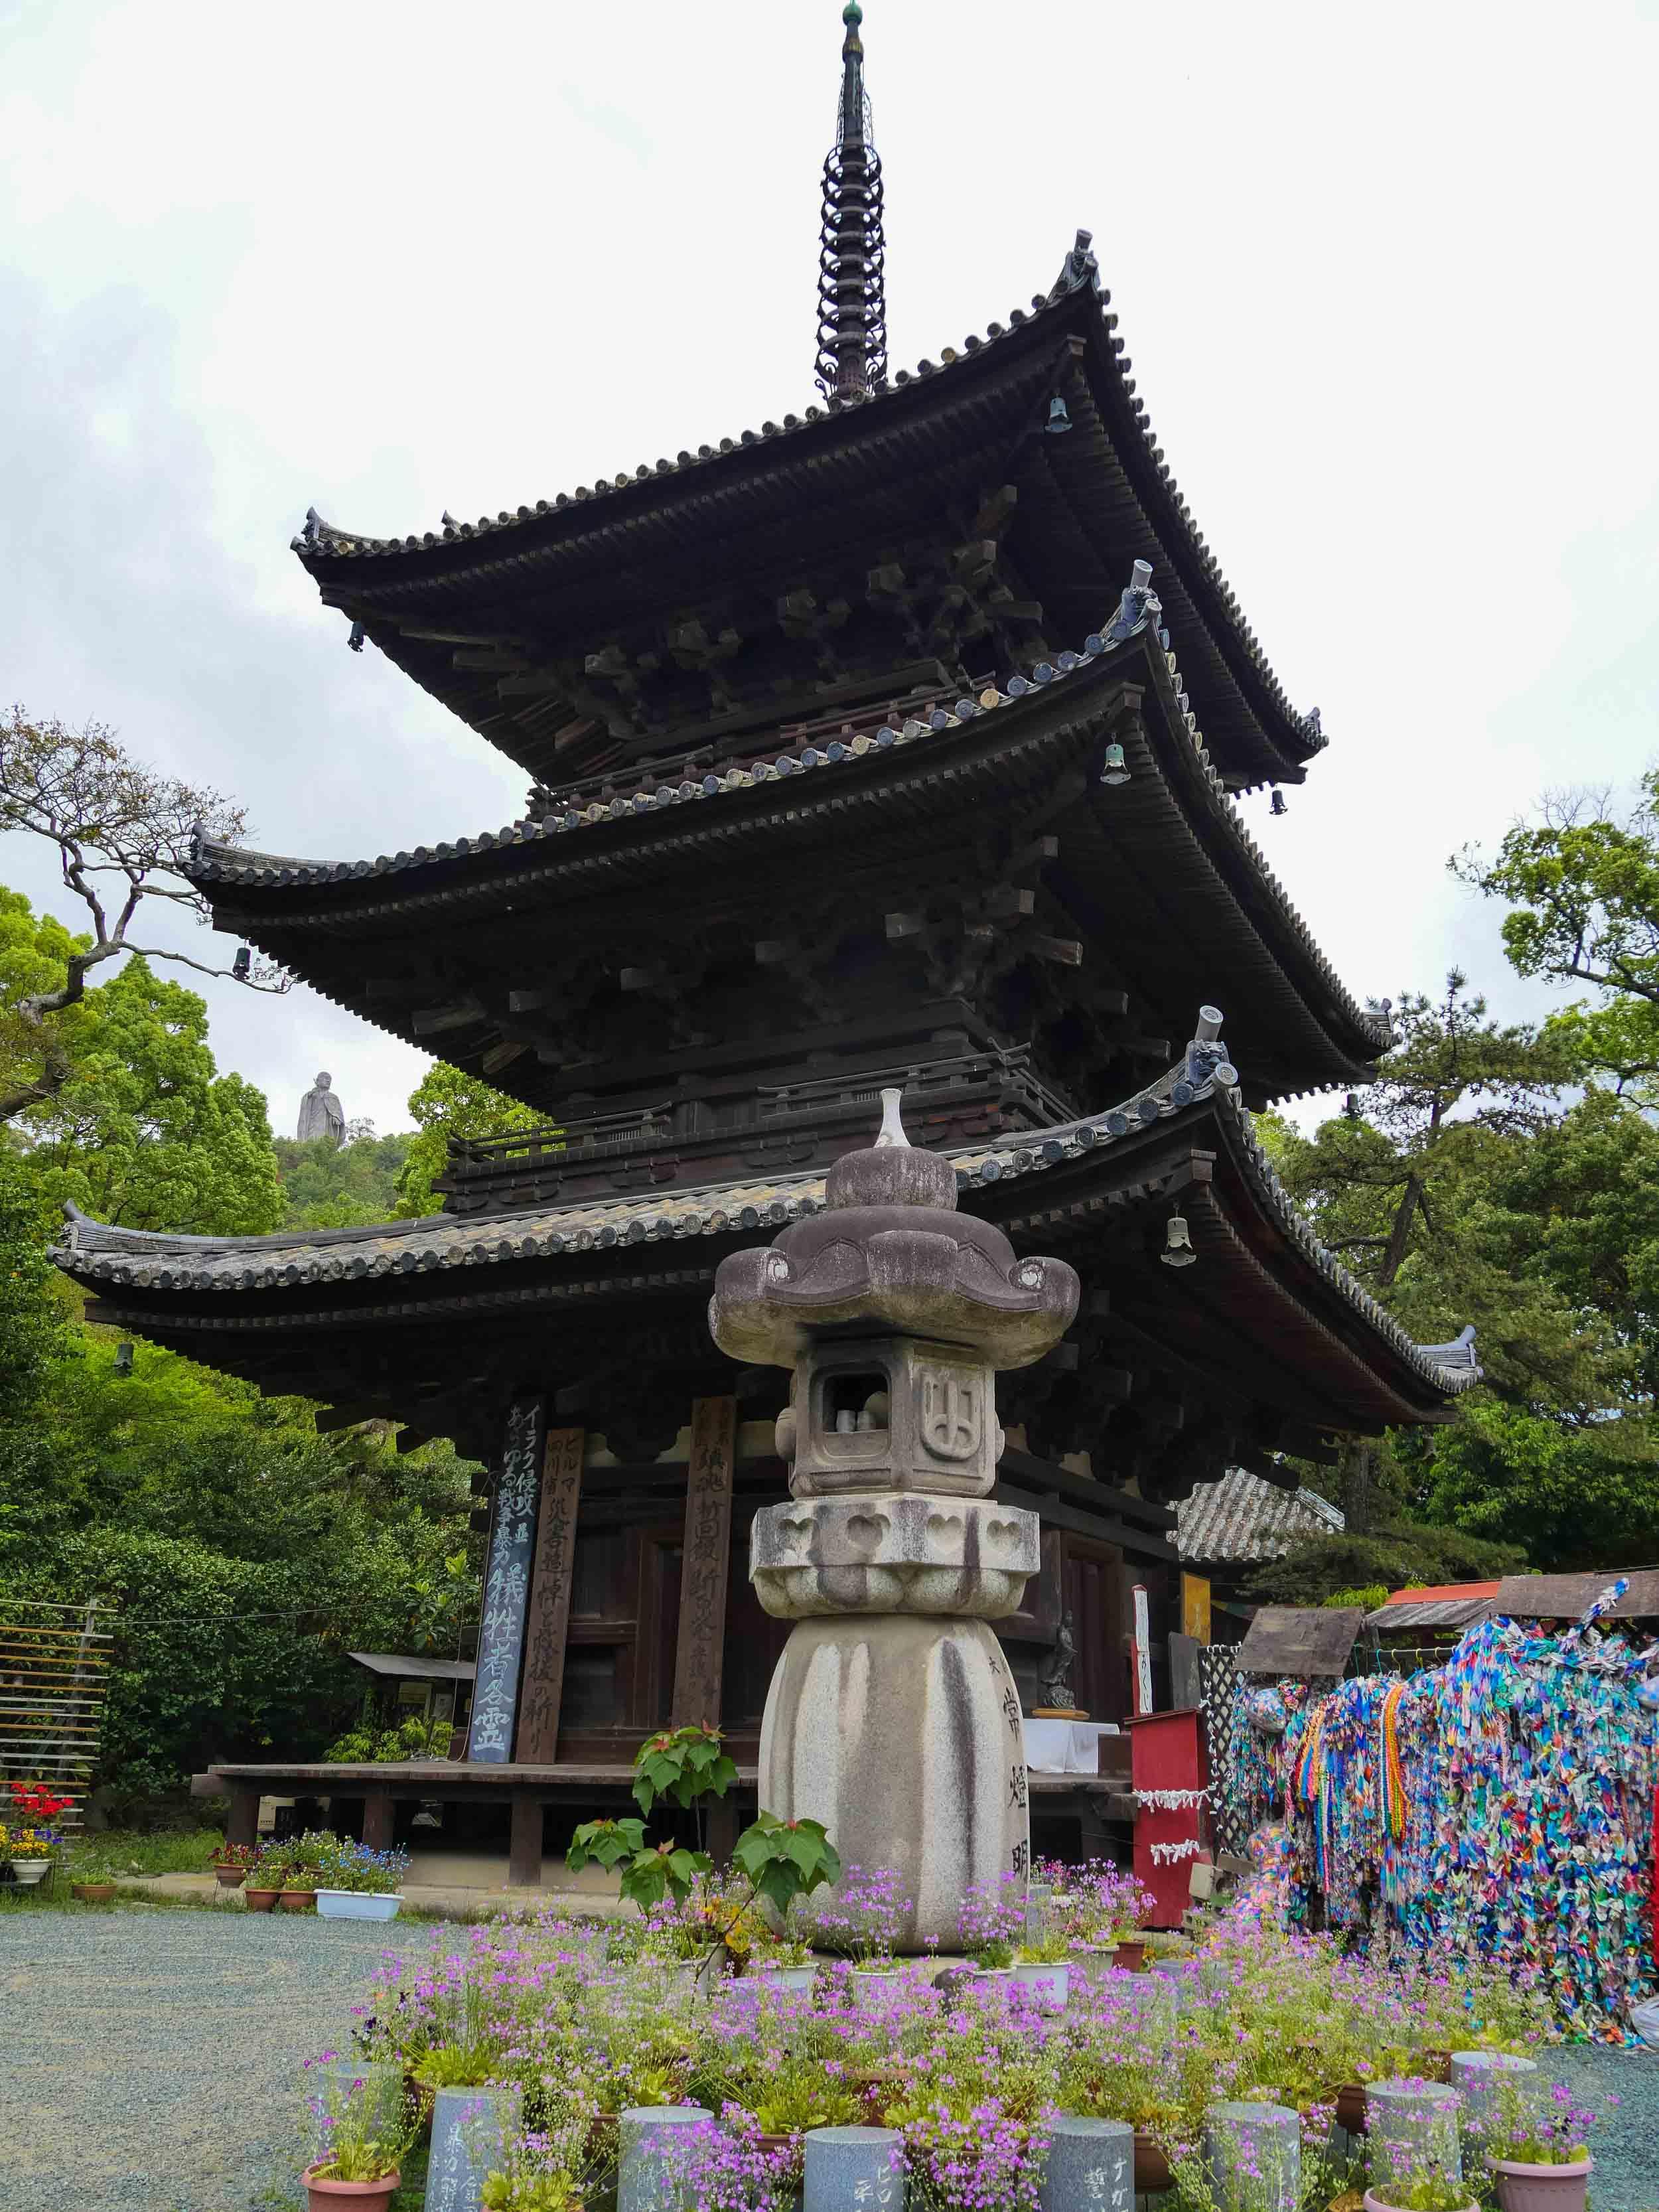 matsuyama-dougo-onsen-58.jpg